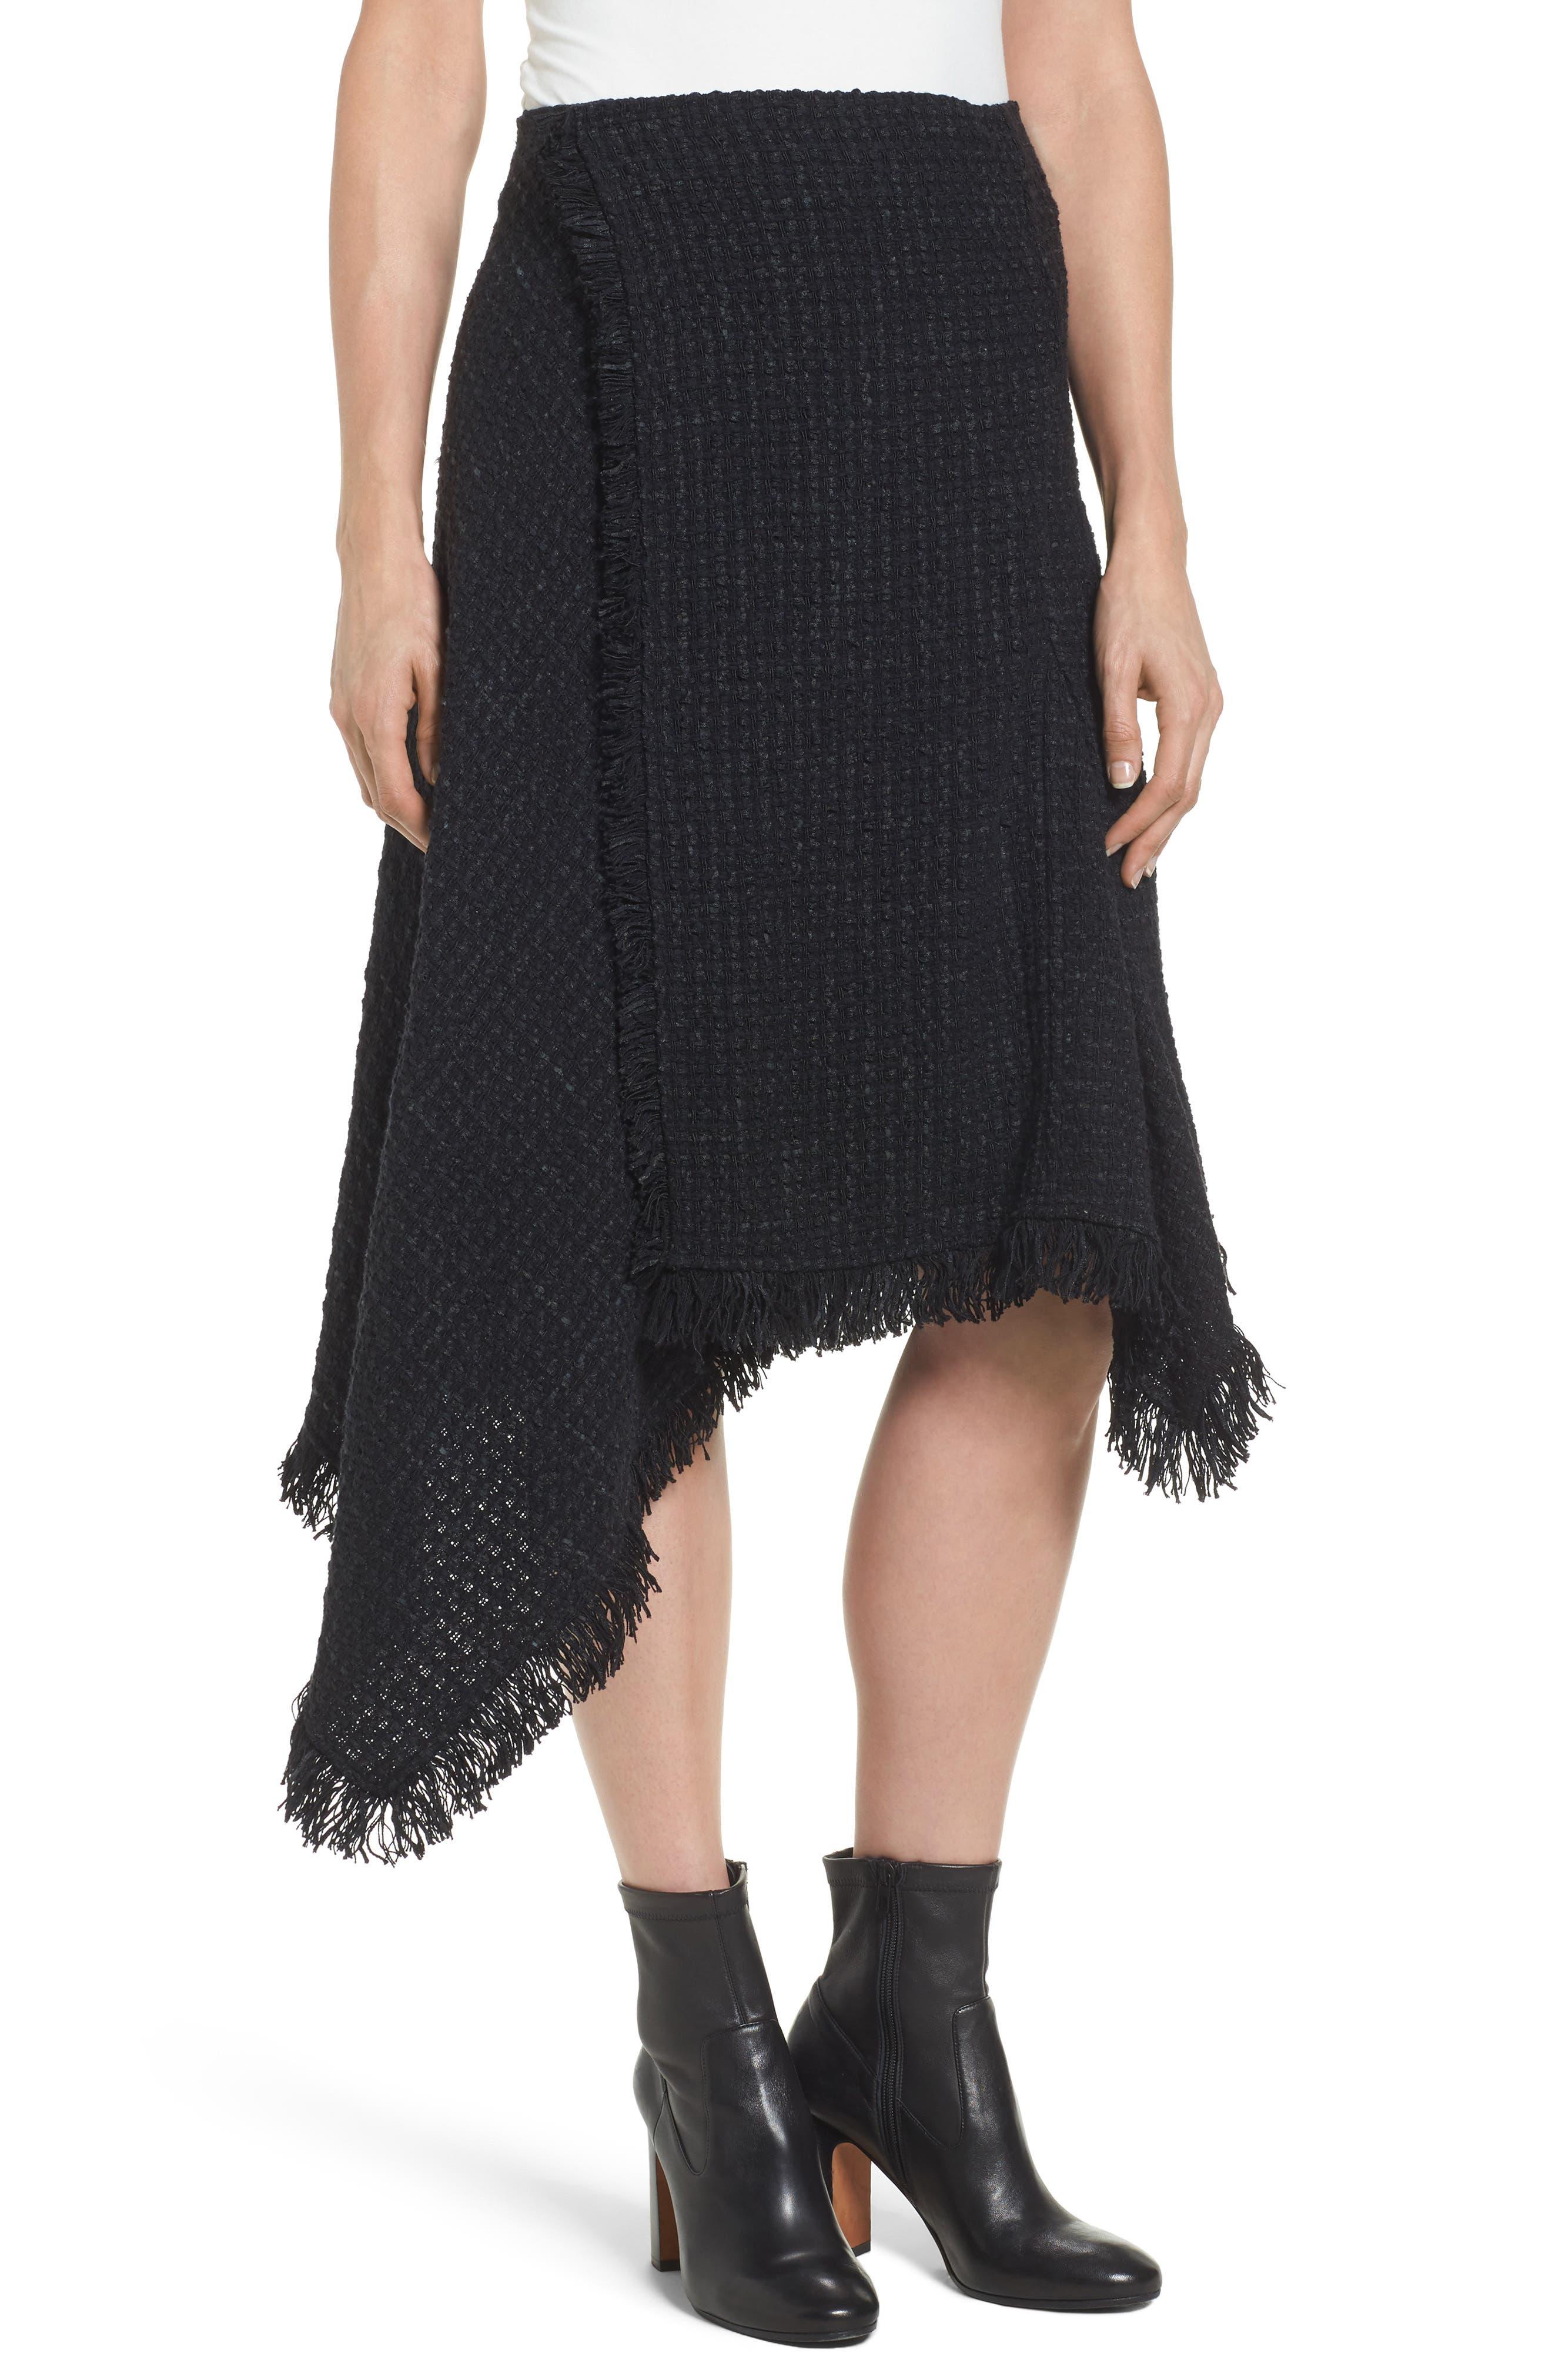 NIC + ZOE Majestic Tweed Skirt,                             Main thumbnail 1, color,                             004